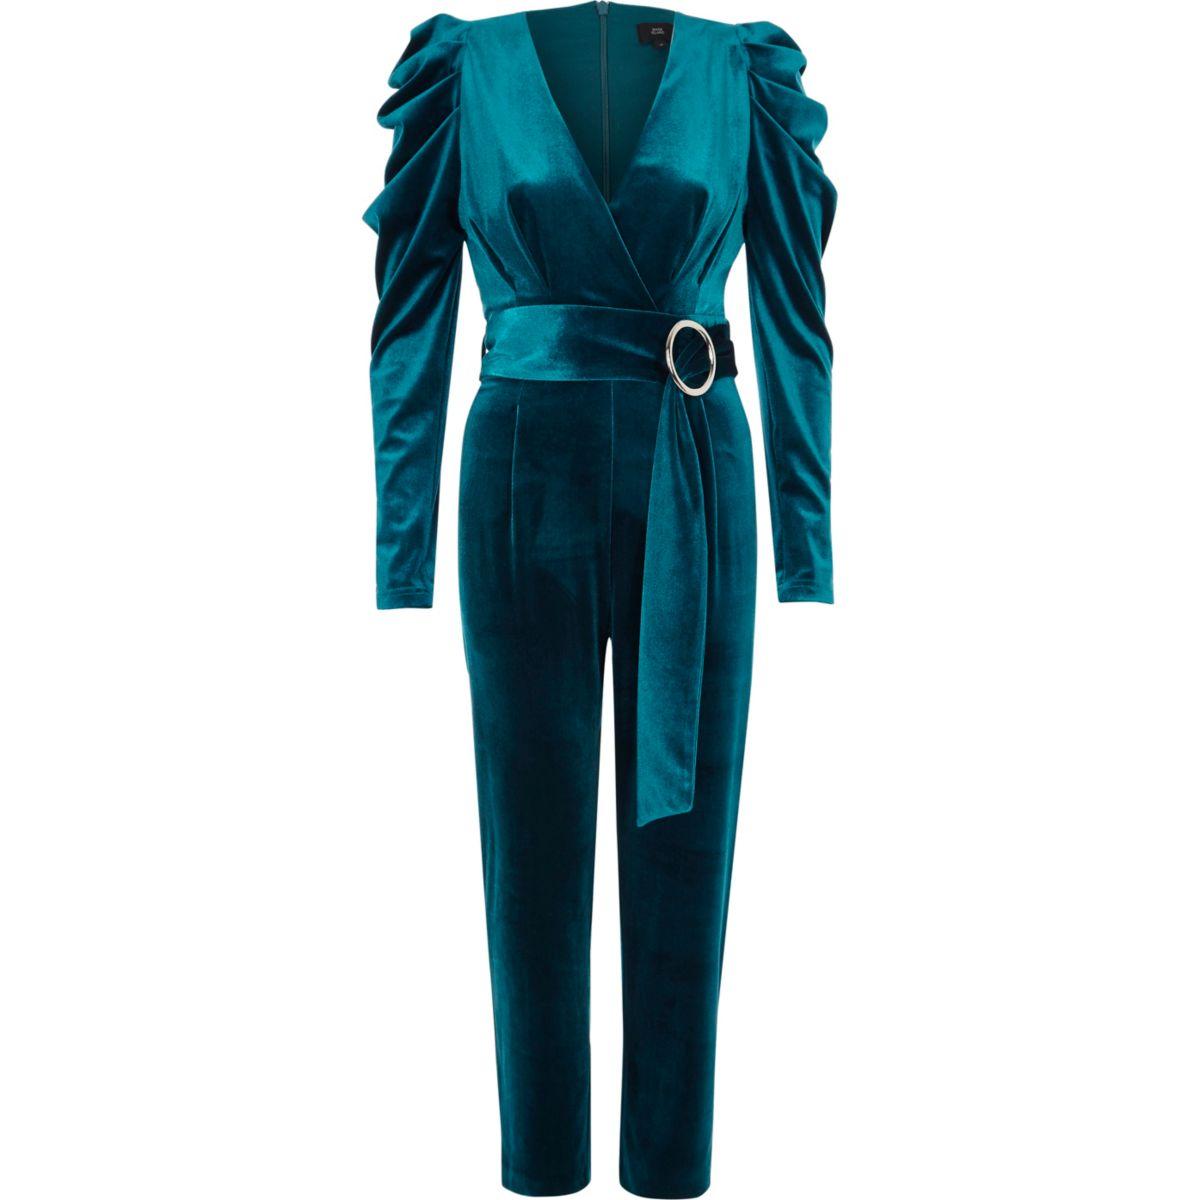 Turquoise blue puff shoulder velvet jumpsuit